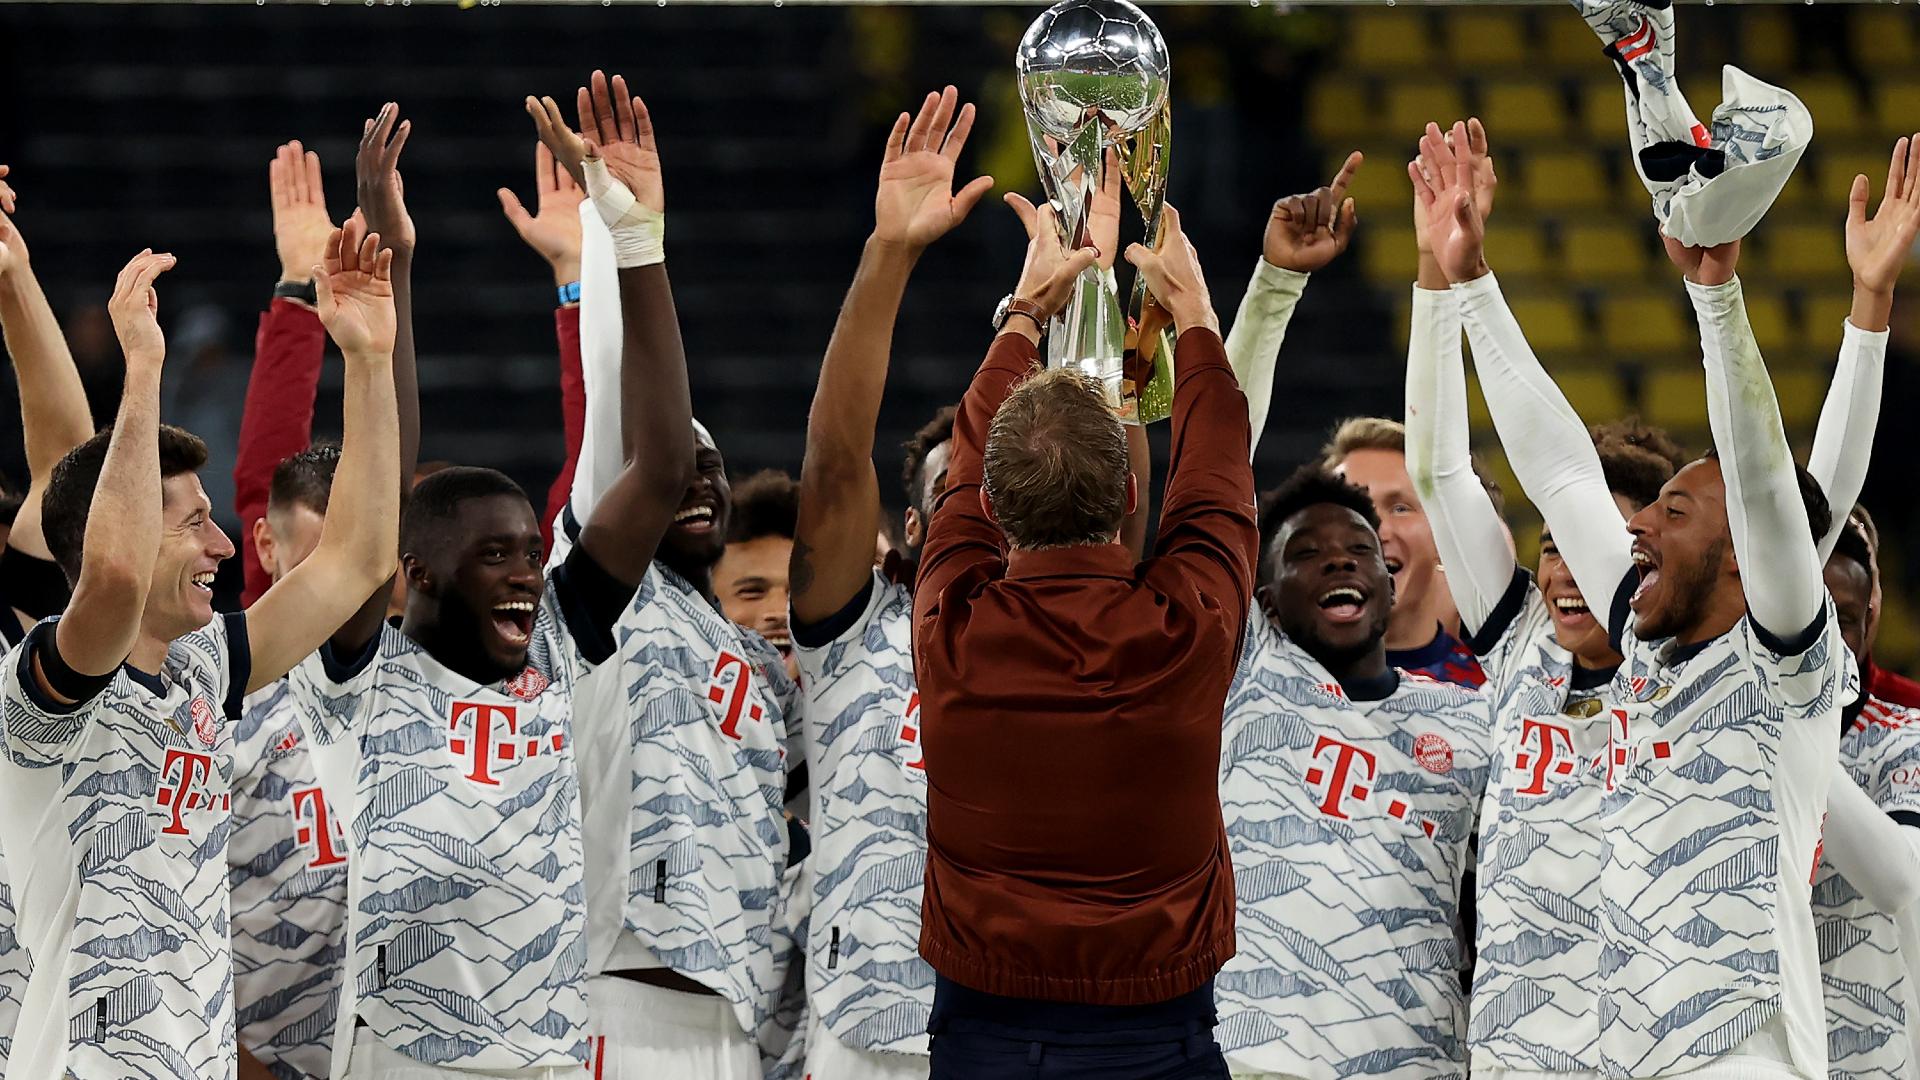 Nagelsmann: Bayern Munich's Super Cup win doesn't belong to me